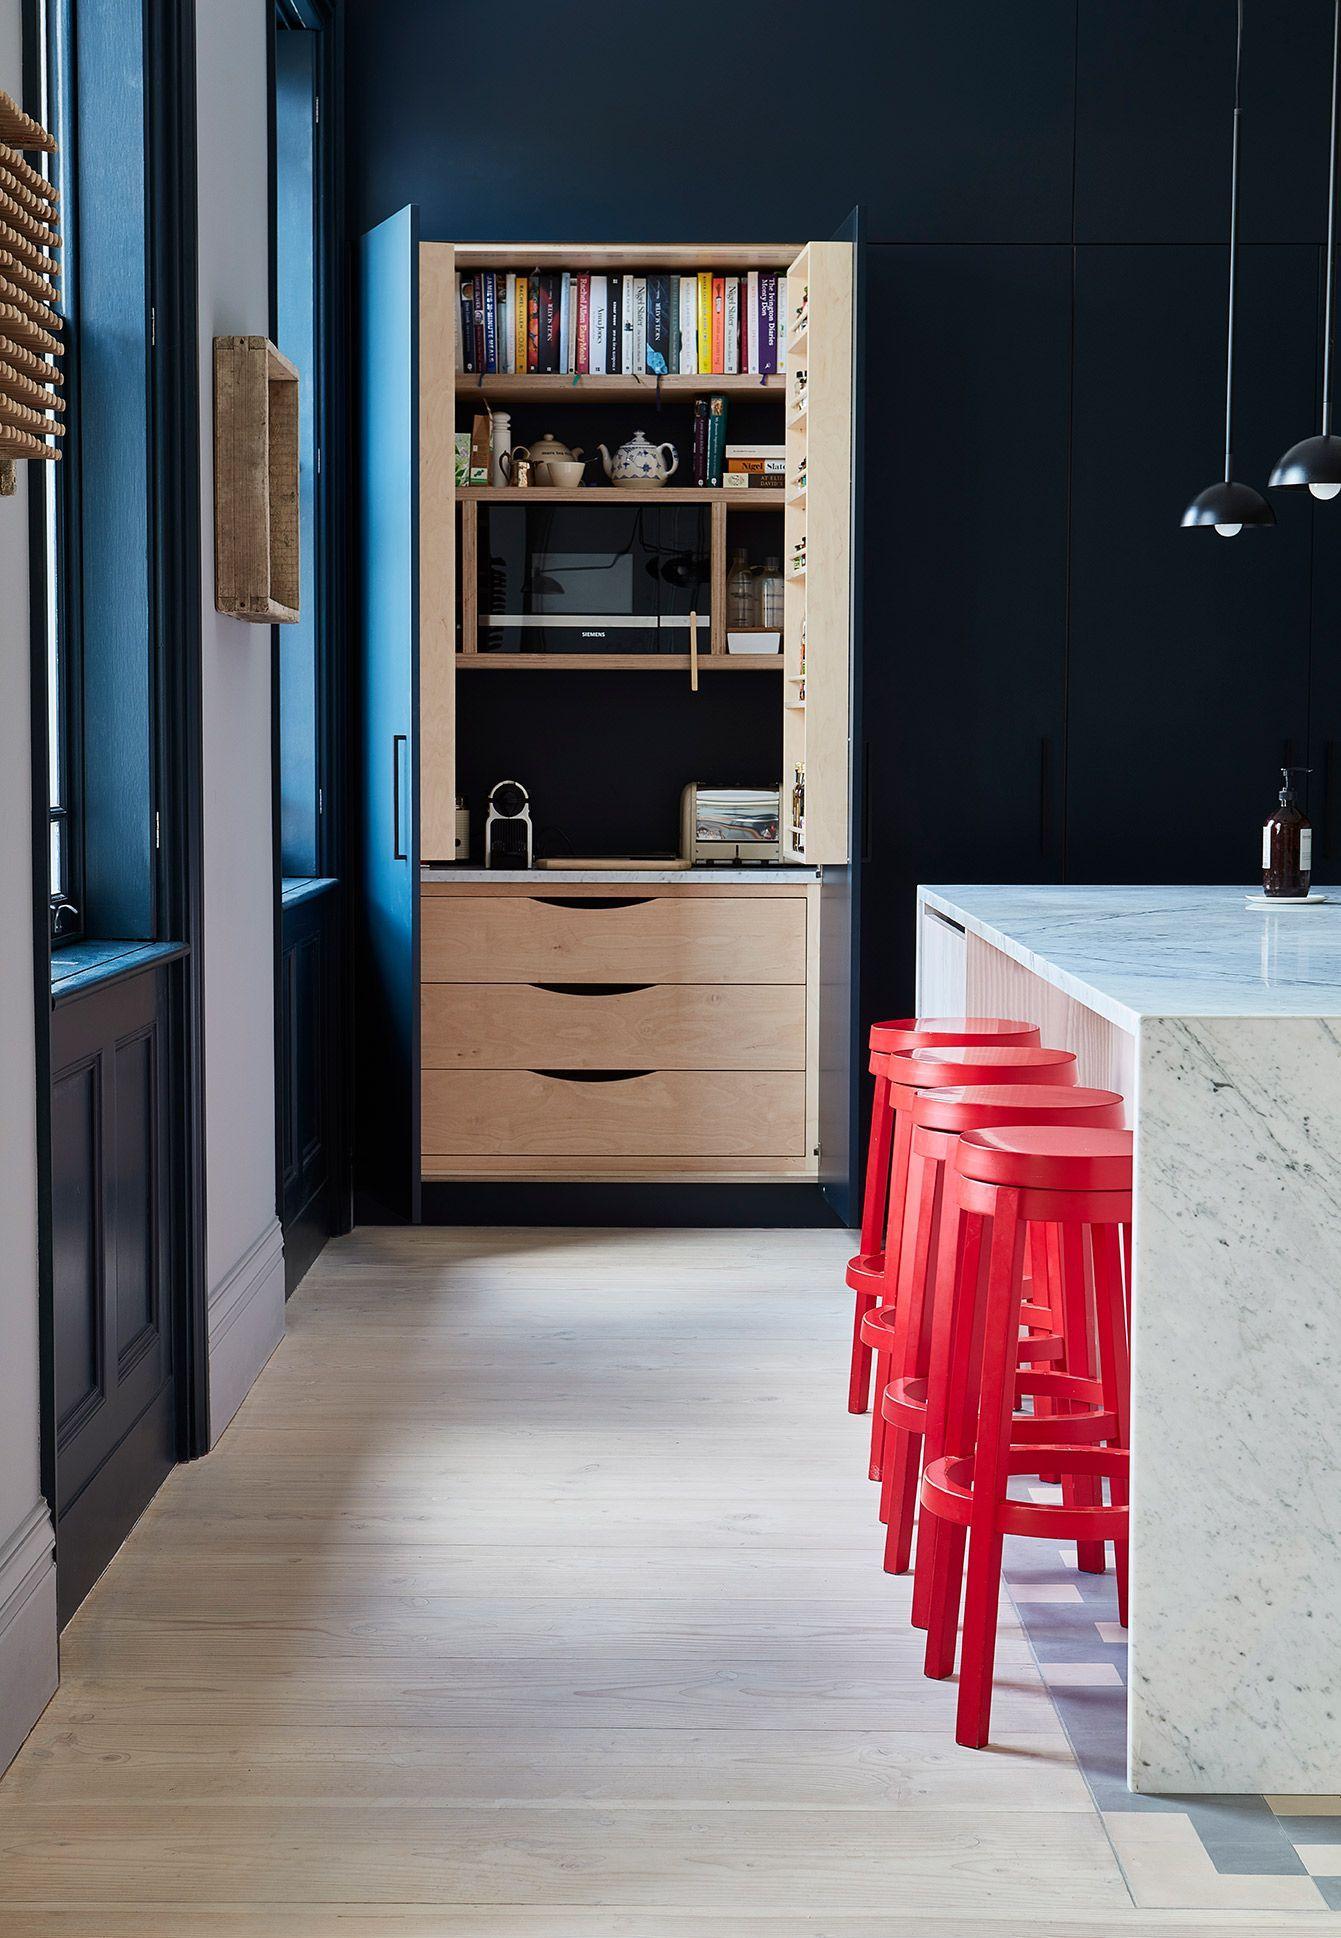 A Beautiful Carrara Marble Kitchen Island Douglas Fir Base Cabinetry And Larder Unit Encaustic Ti Kitchen Marble Marble Kitchen Island Carrara Marble Kitchen